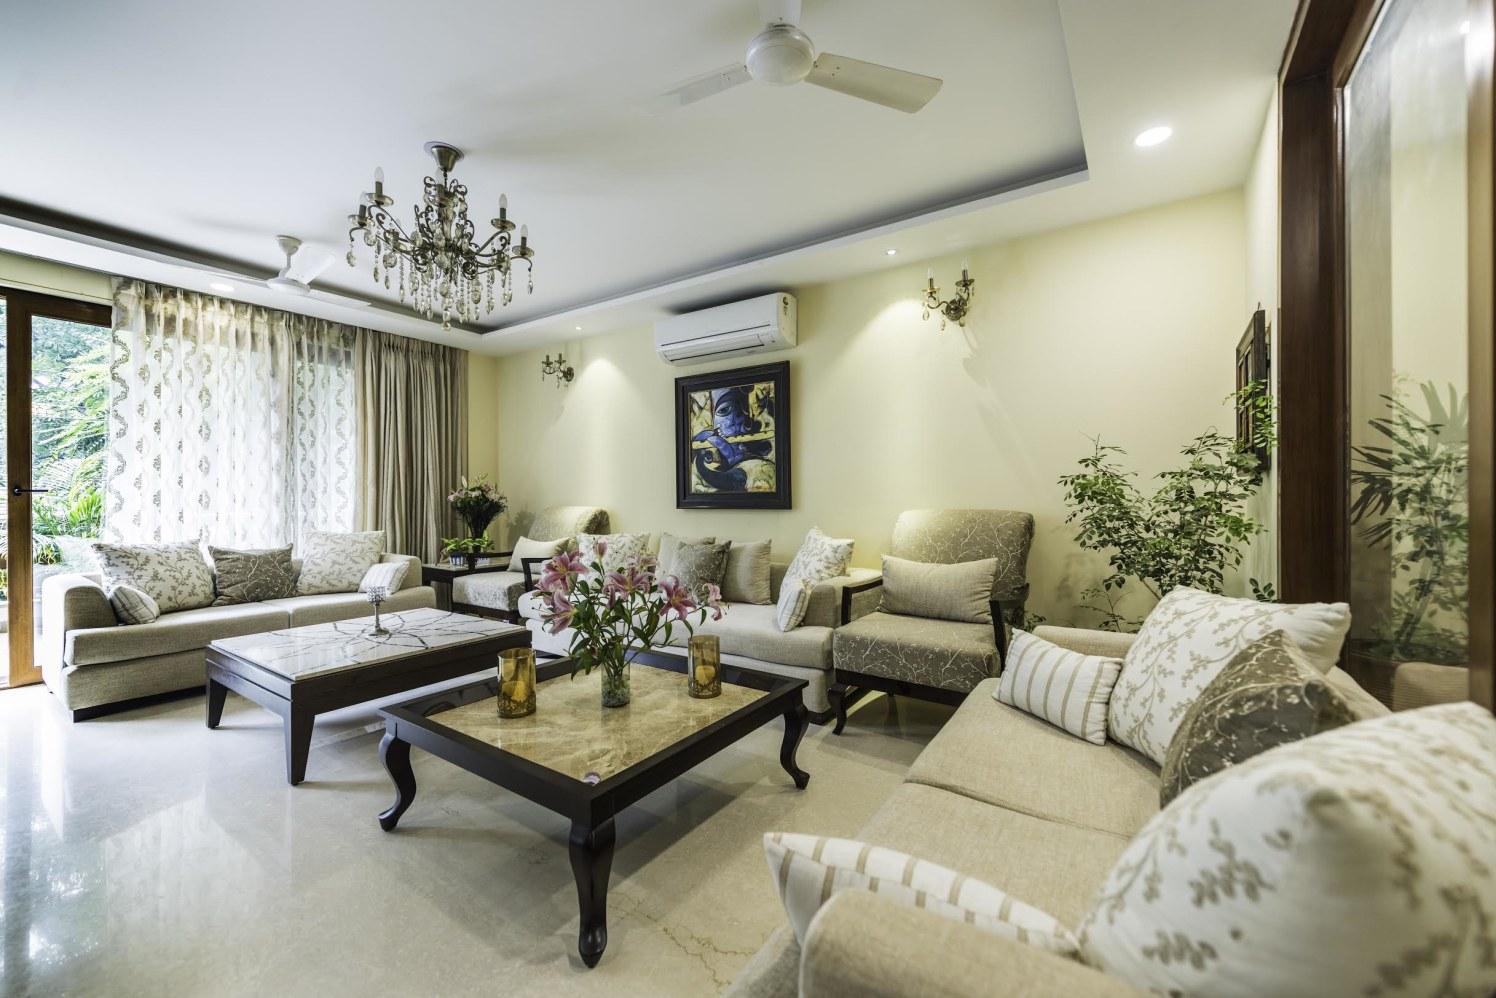 Living Room With Bulky Beige Furniture by Vijay Kapur Living-room Contemporary   Interior Design Photos & Ideas